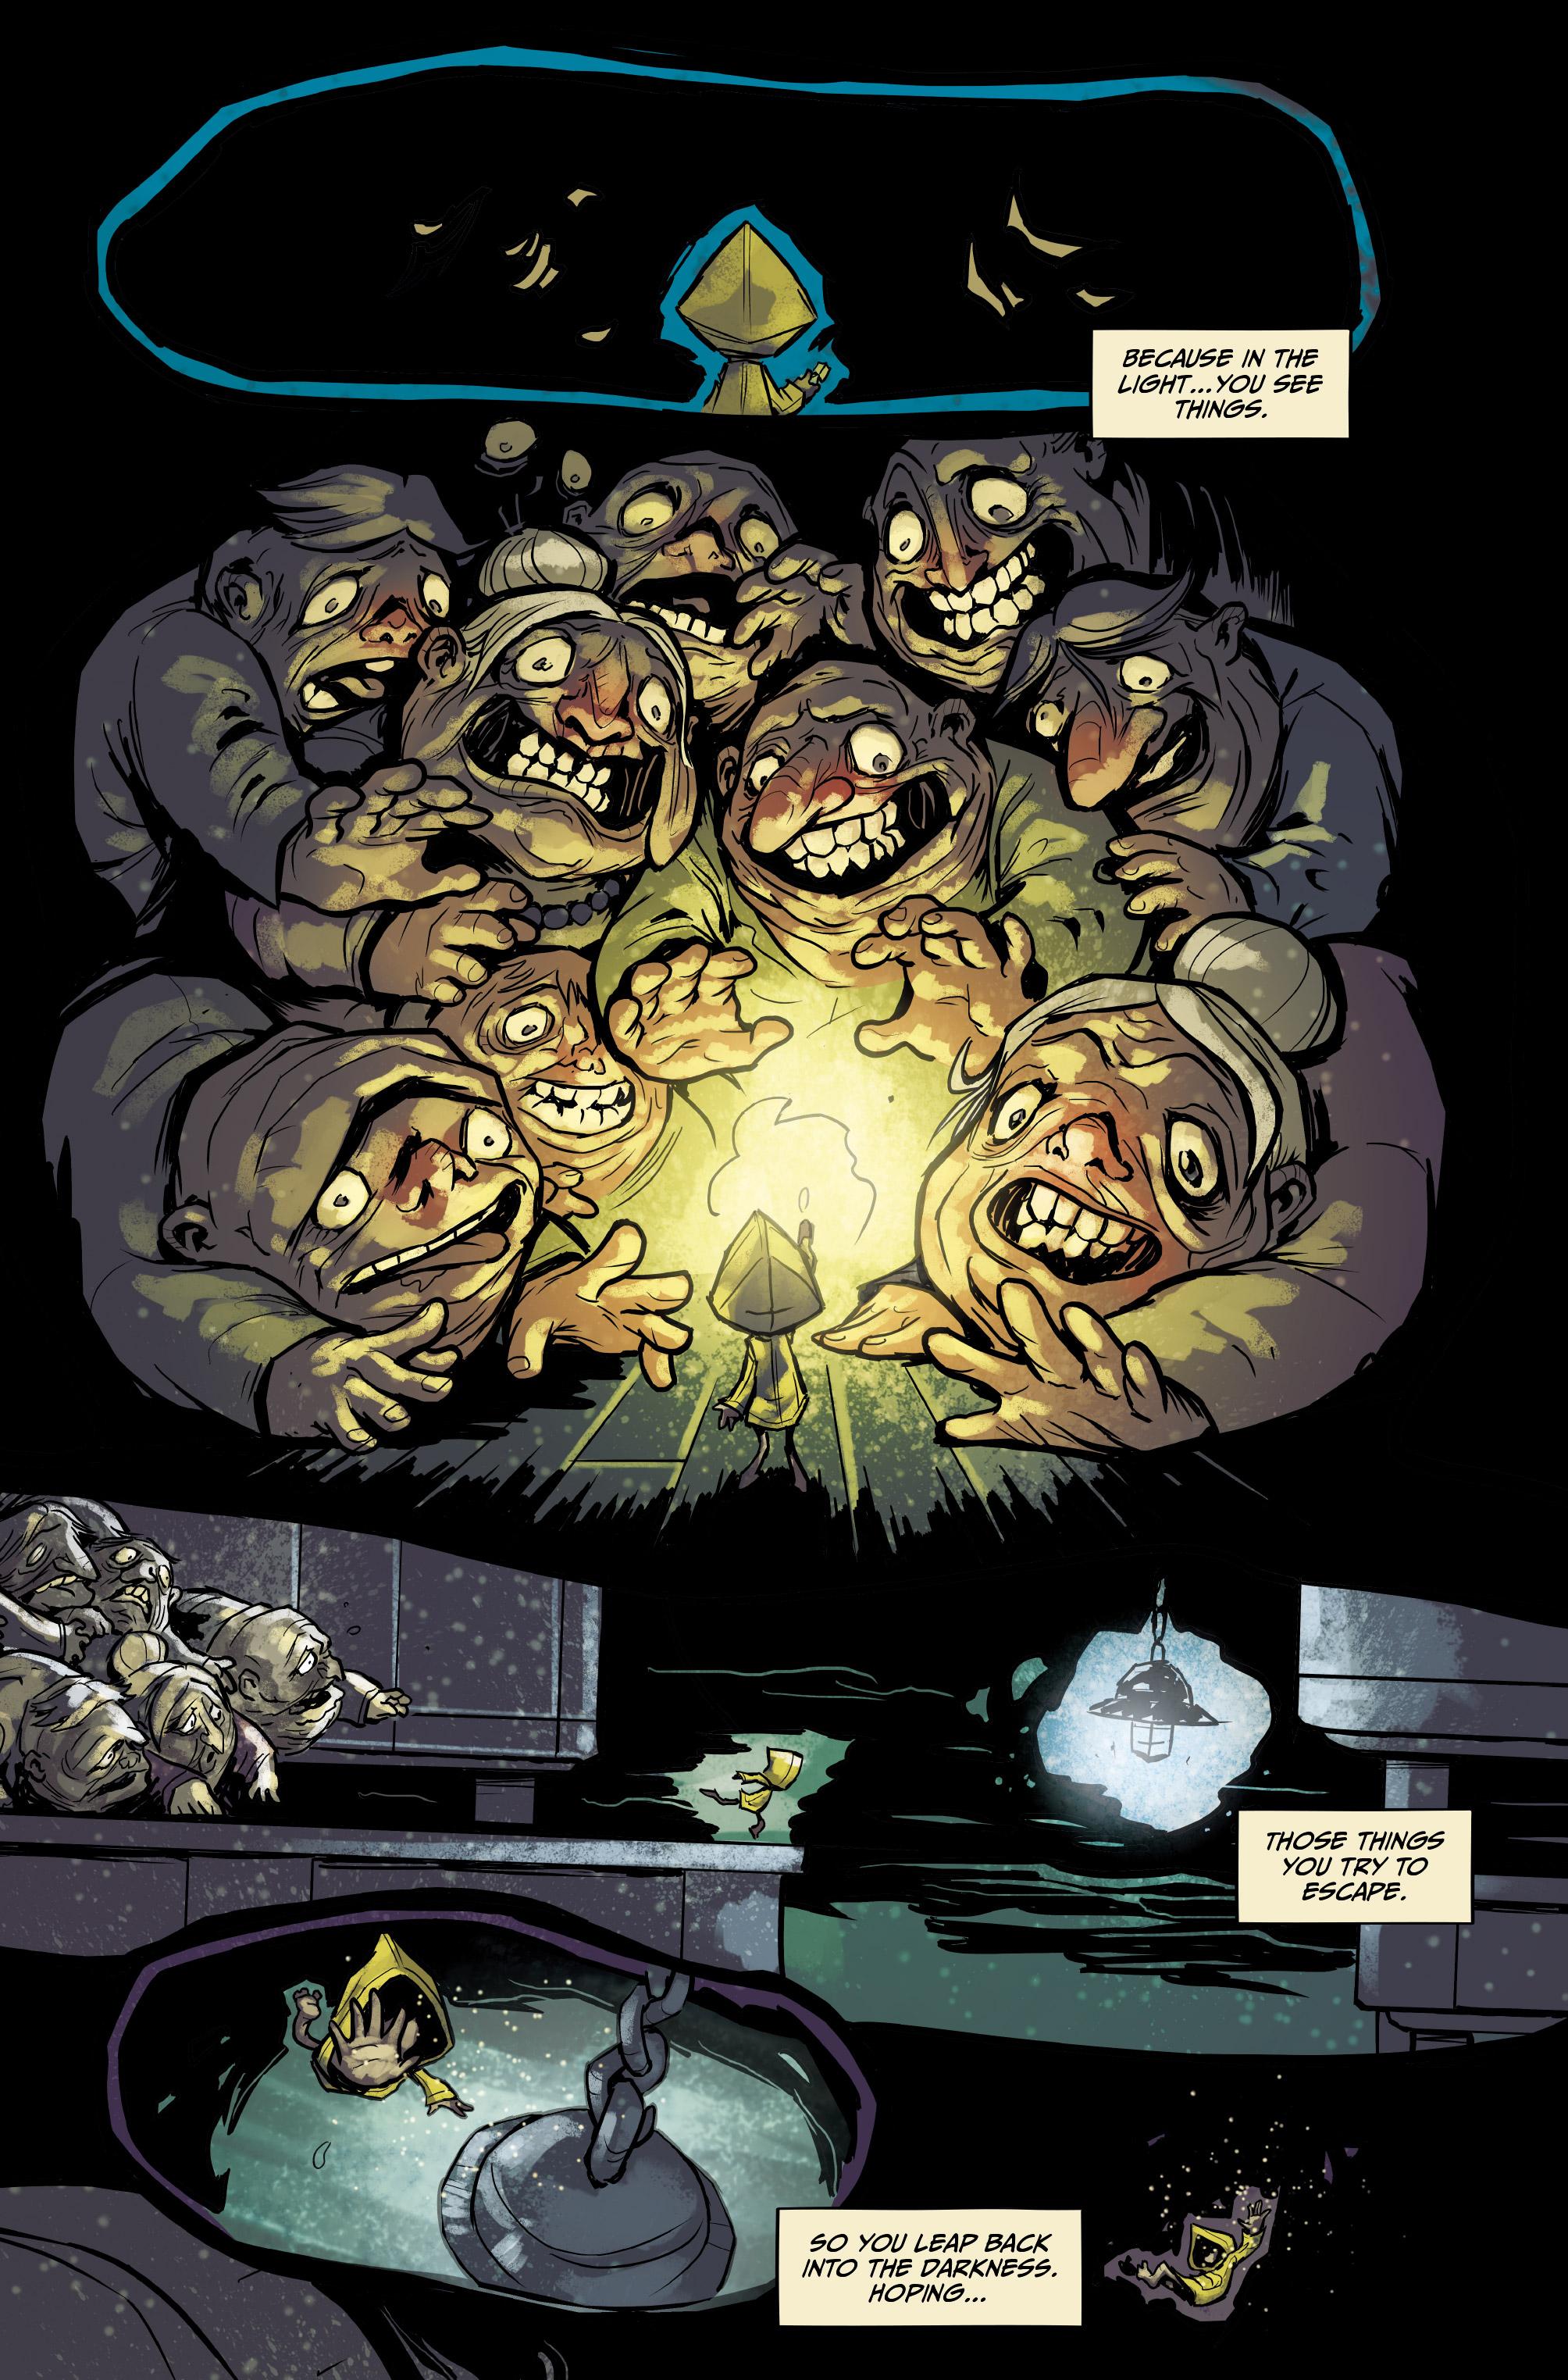 Read online Little Nightmares comic -  Issue #1 - 10